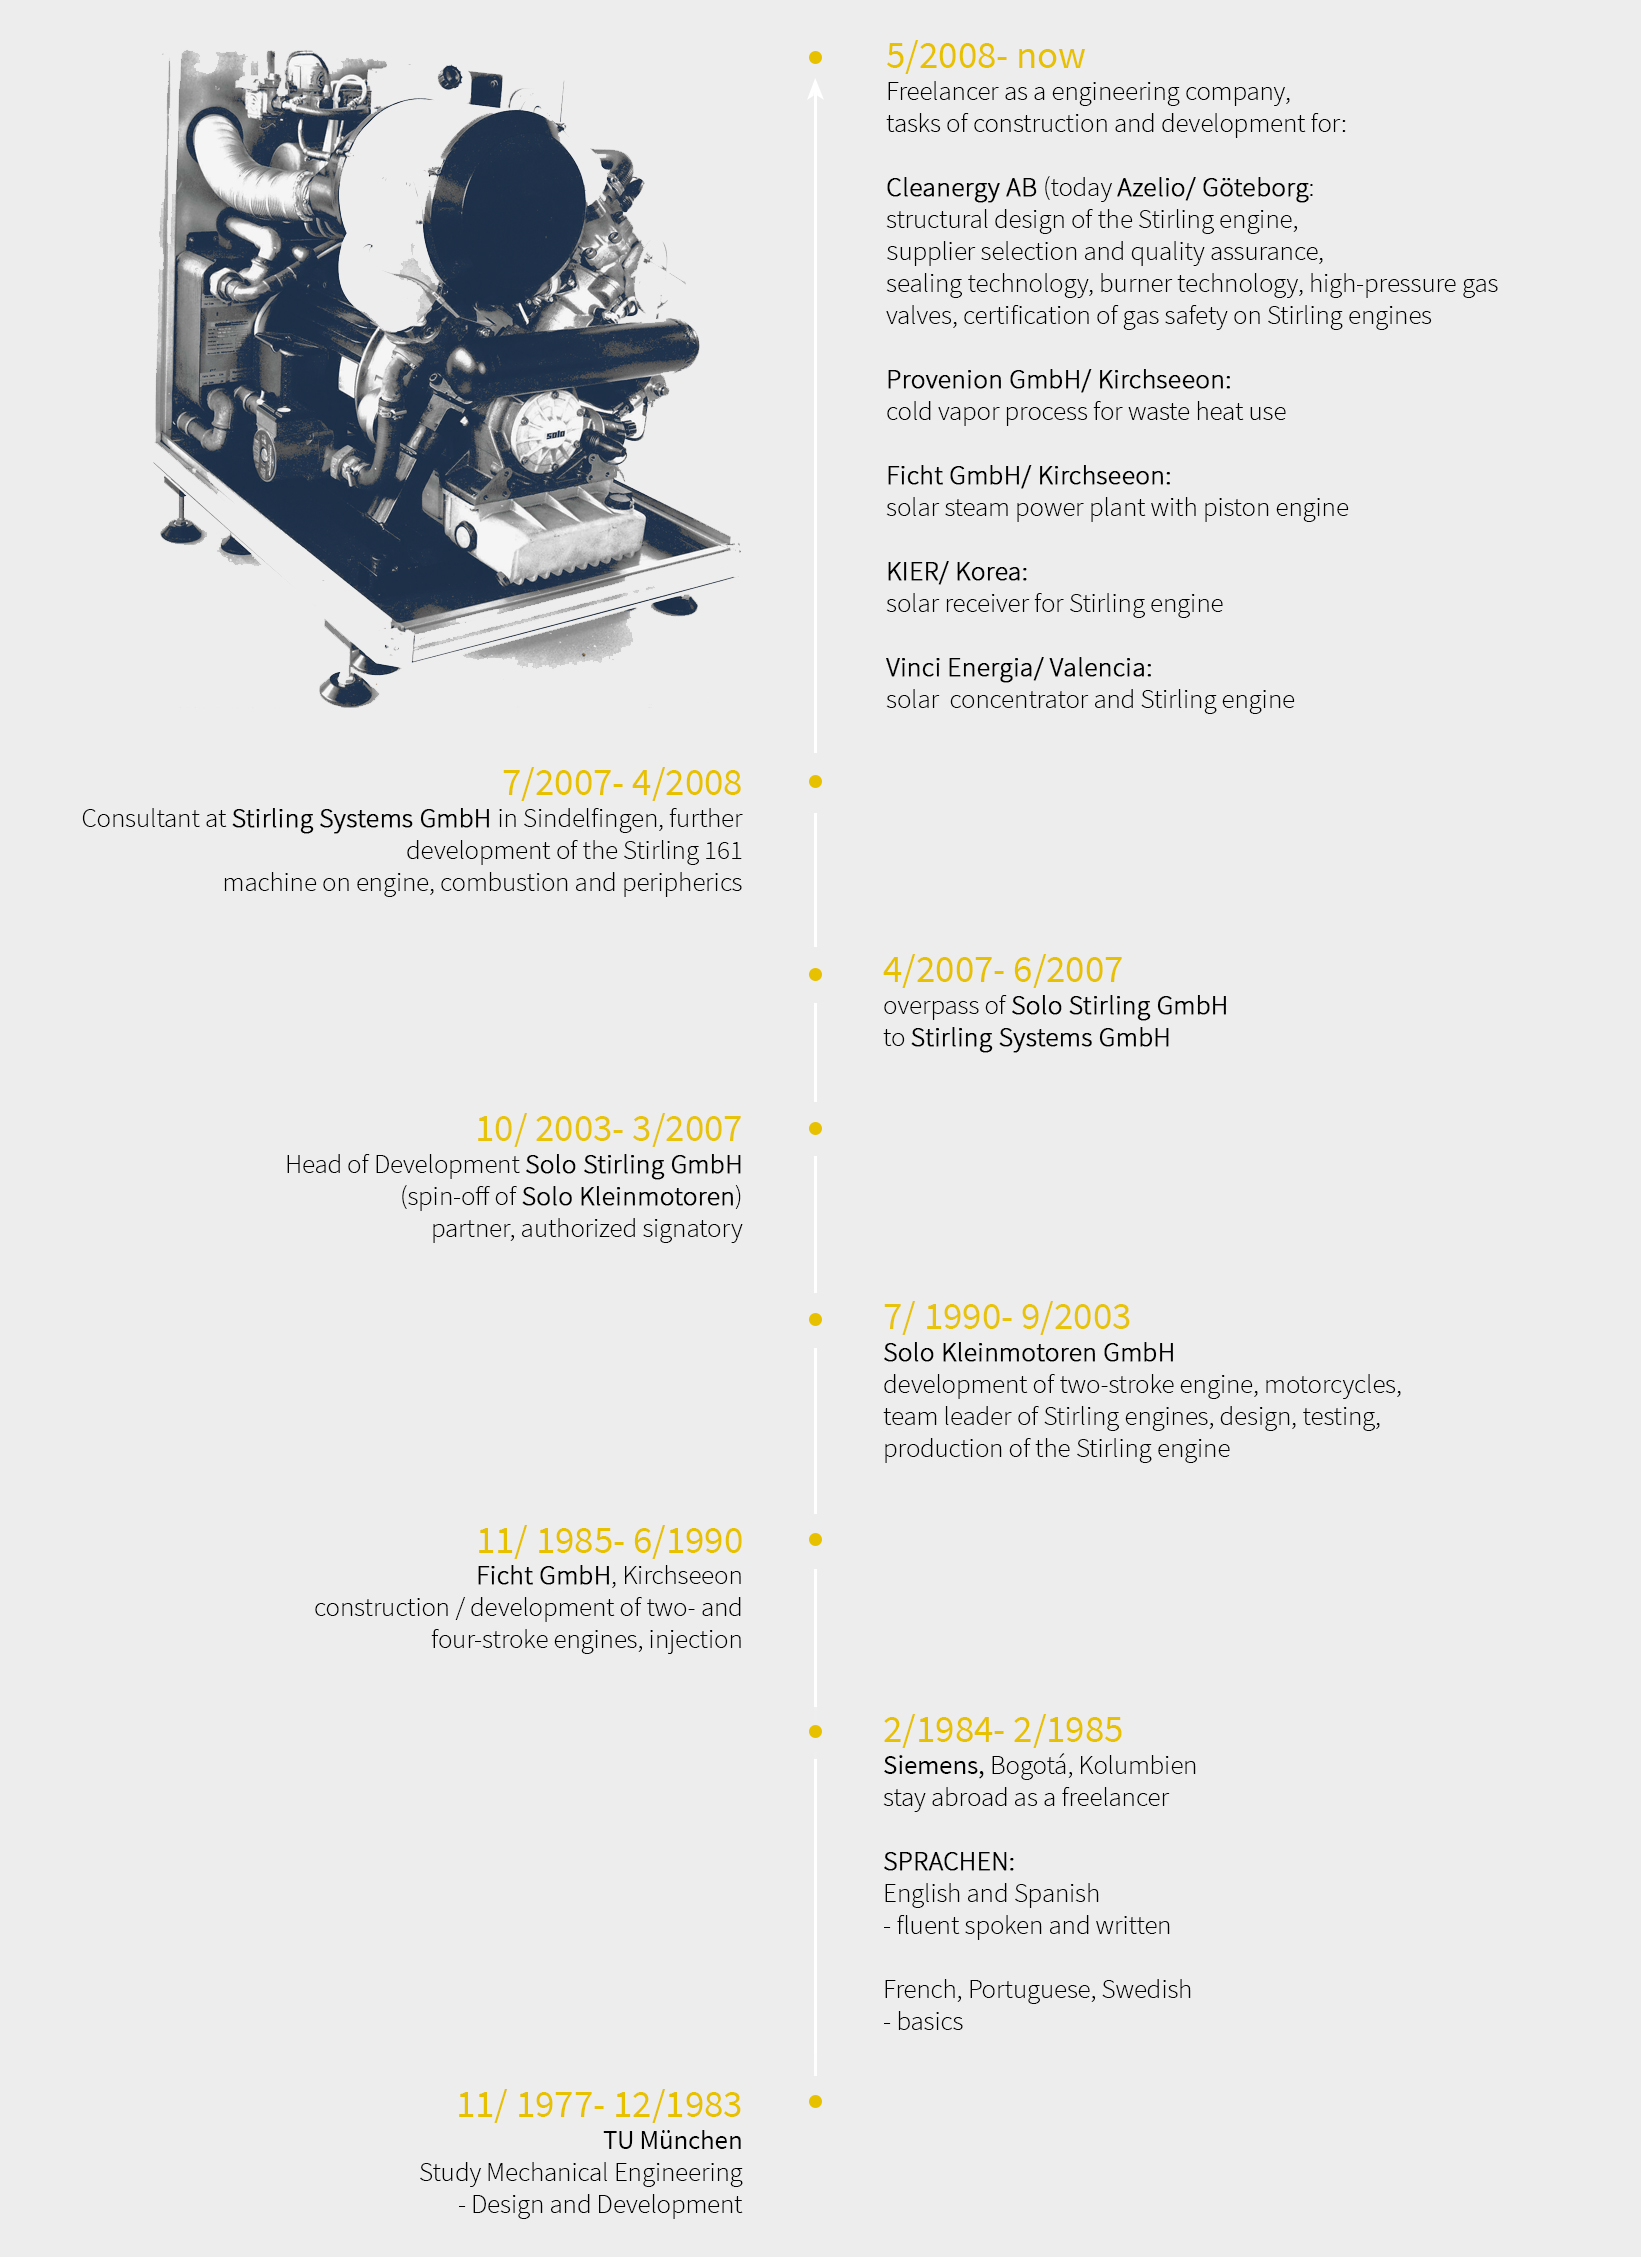 Stirling technology company